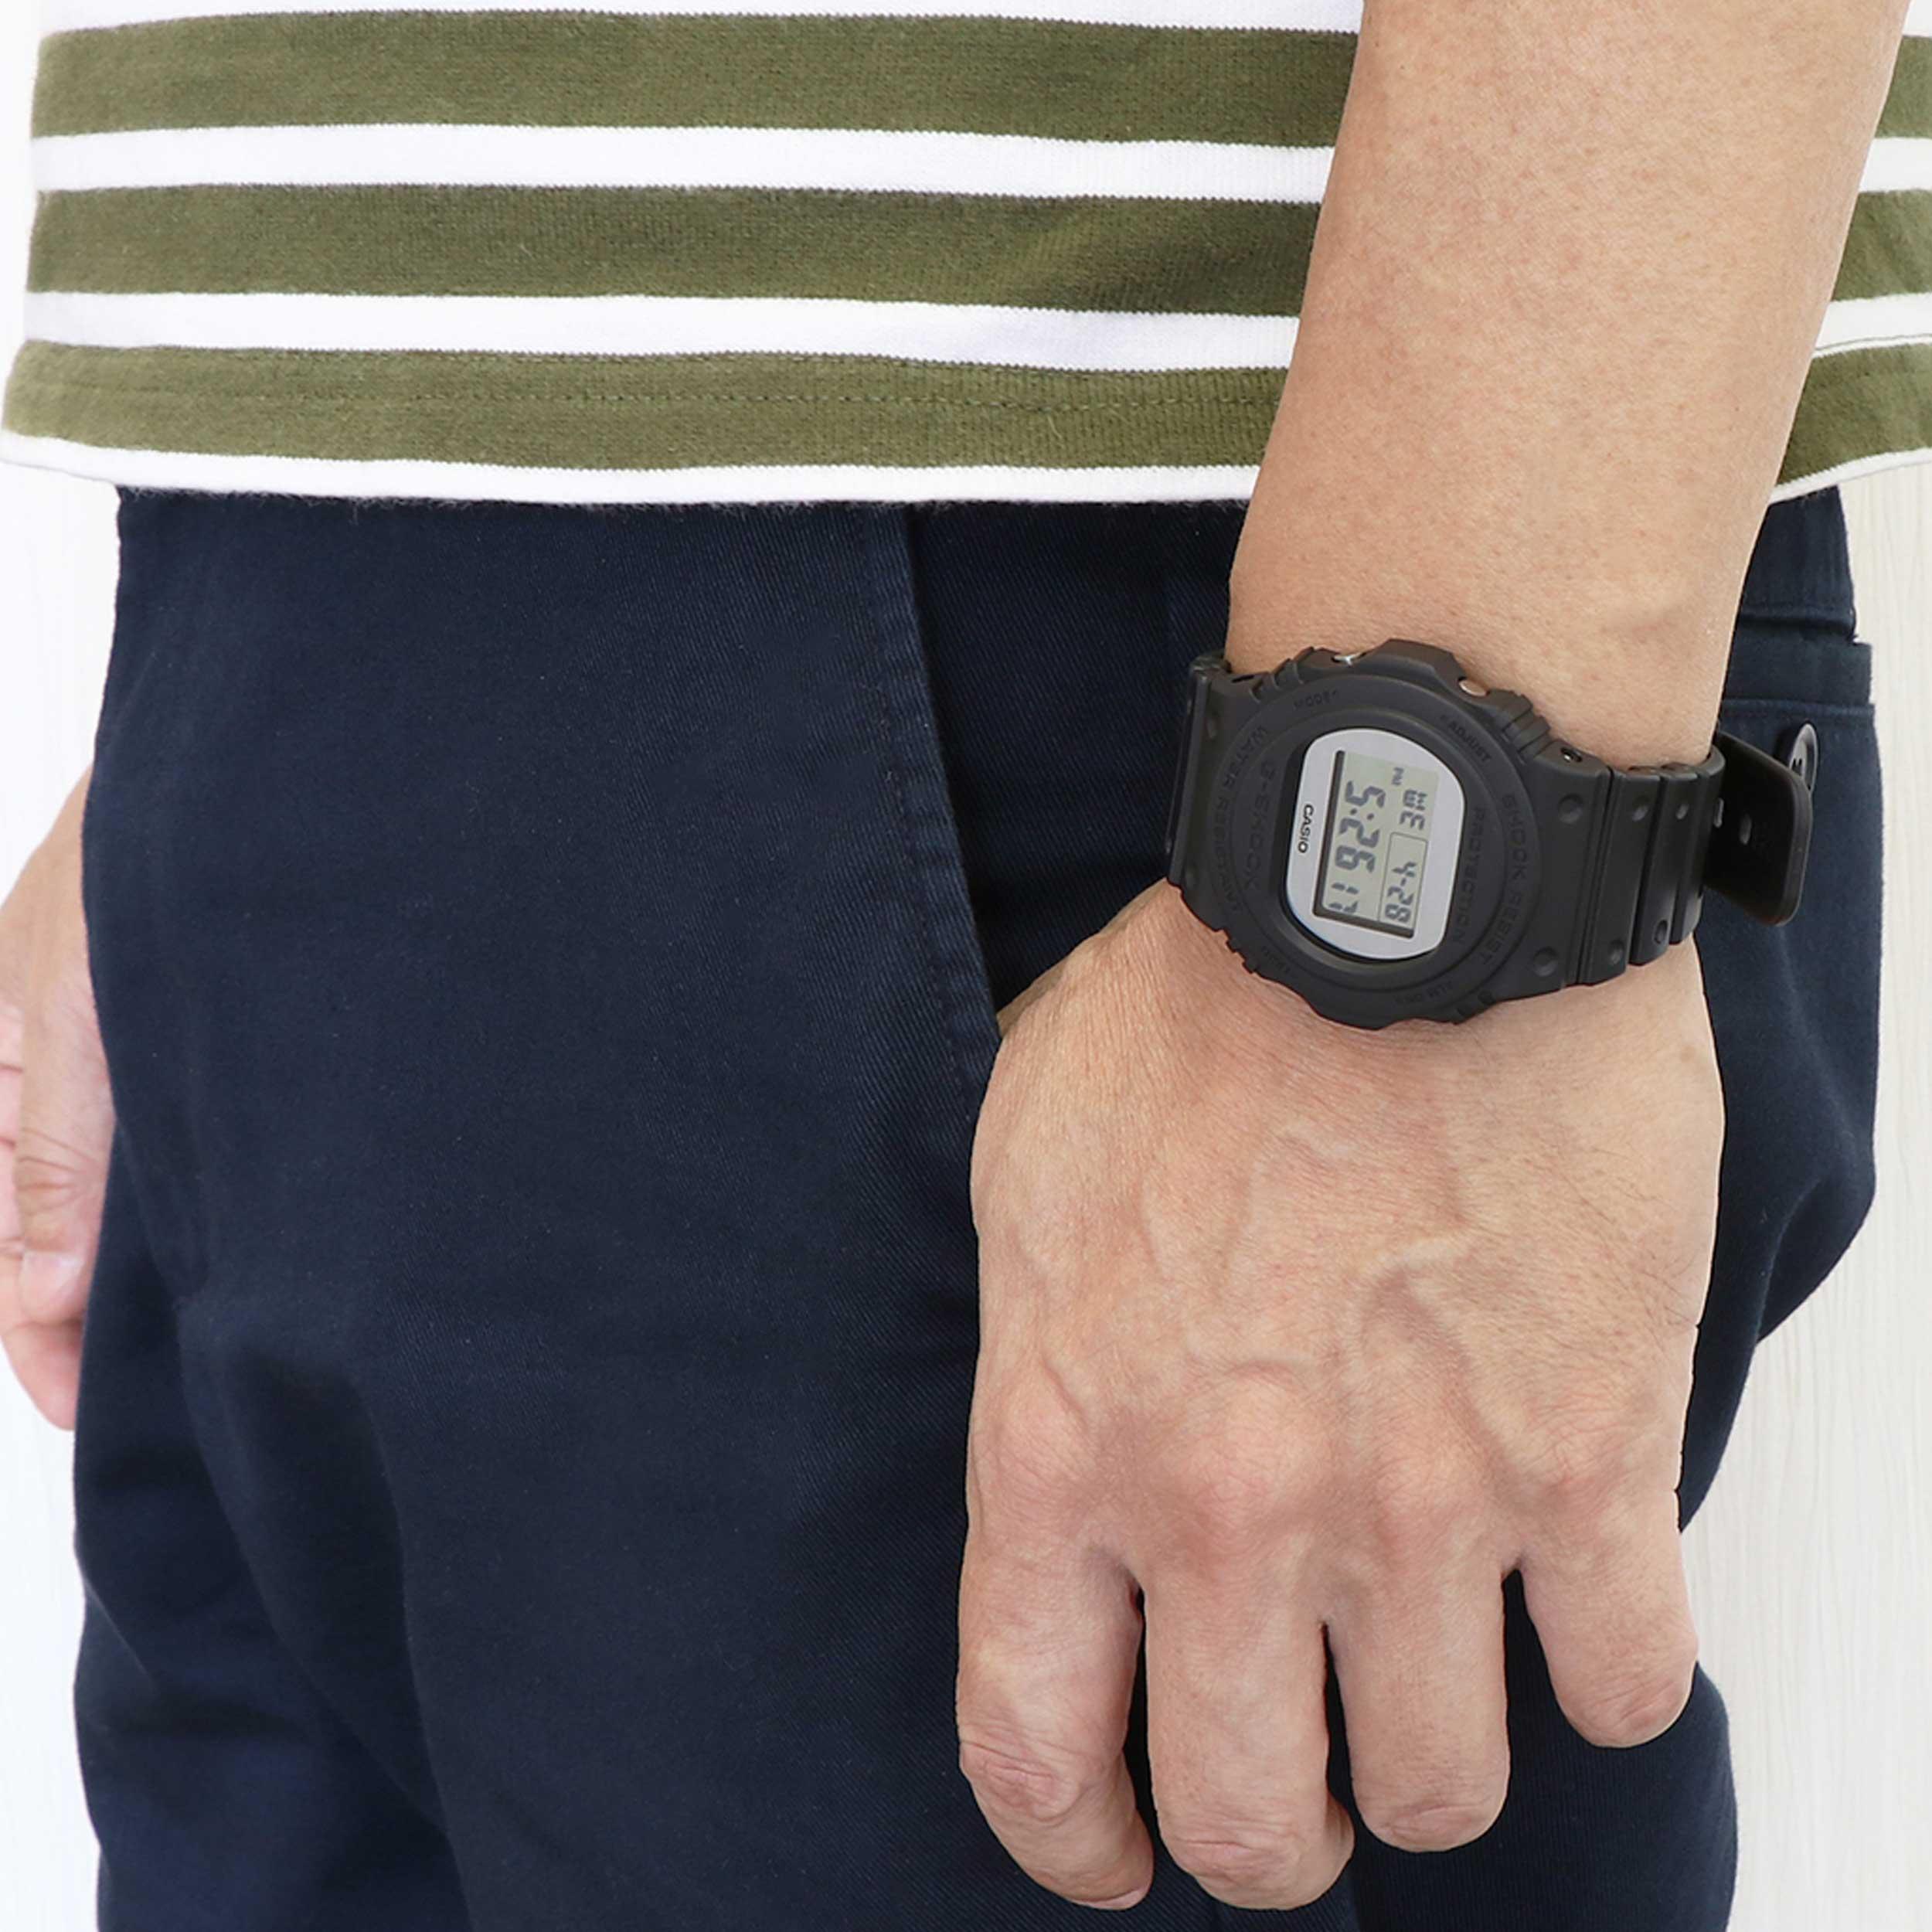 ساعت مچی دیجیتال مردانه کاسیو مدل DW-5700BBMA-1DR              اصل